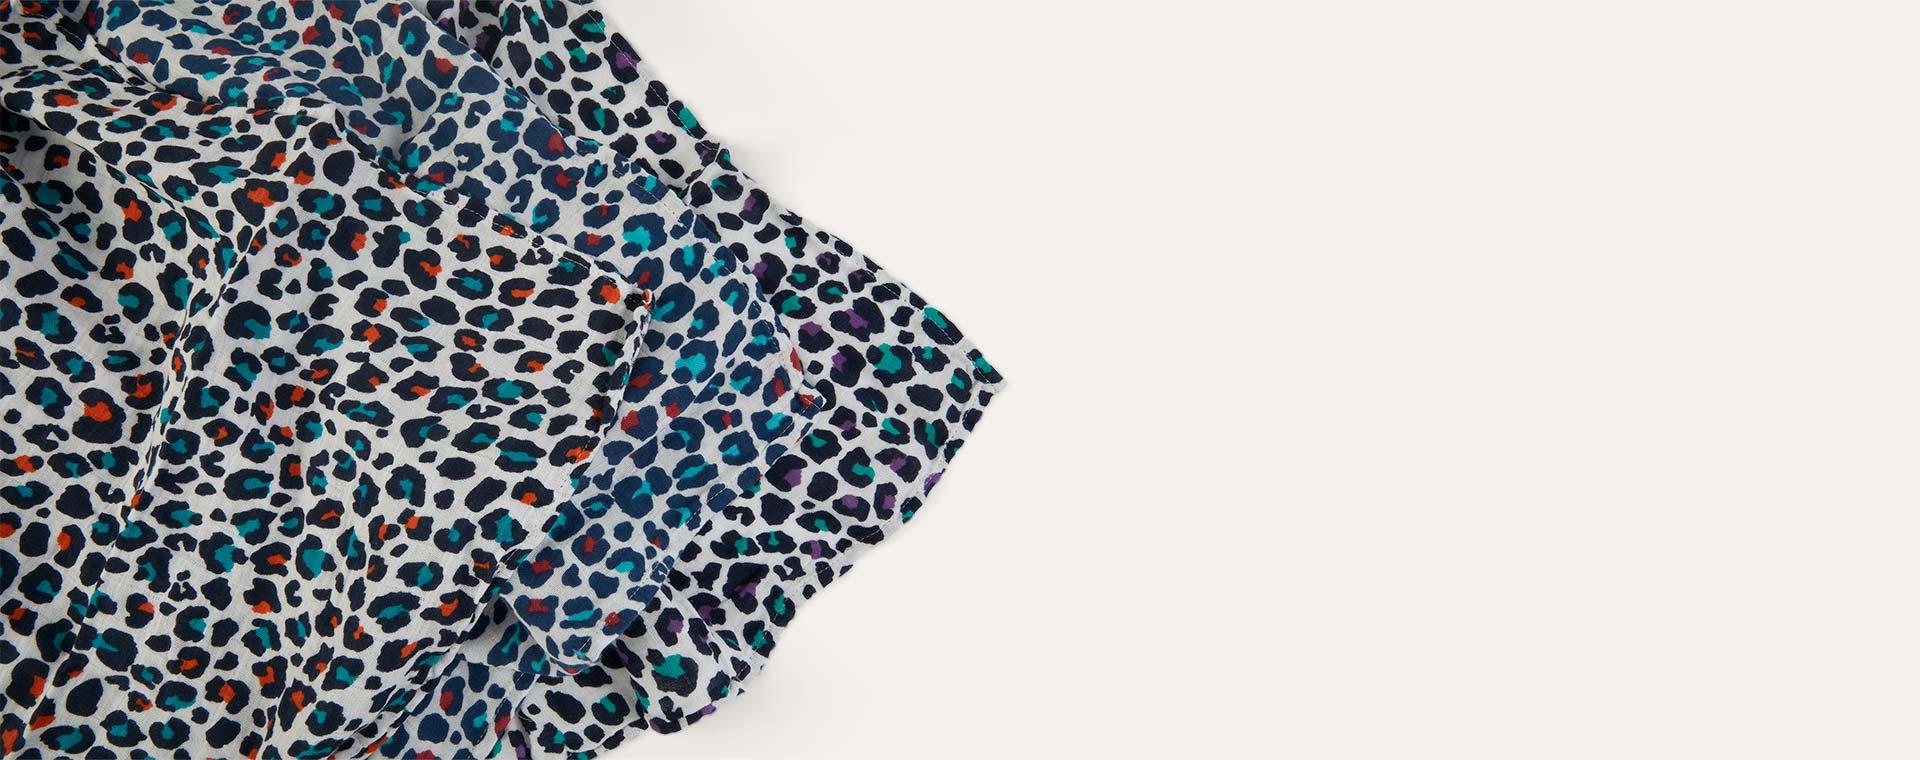 Leopard Etta Loves Sensory Muslins - 3 Pack